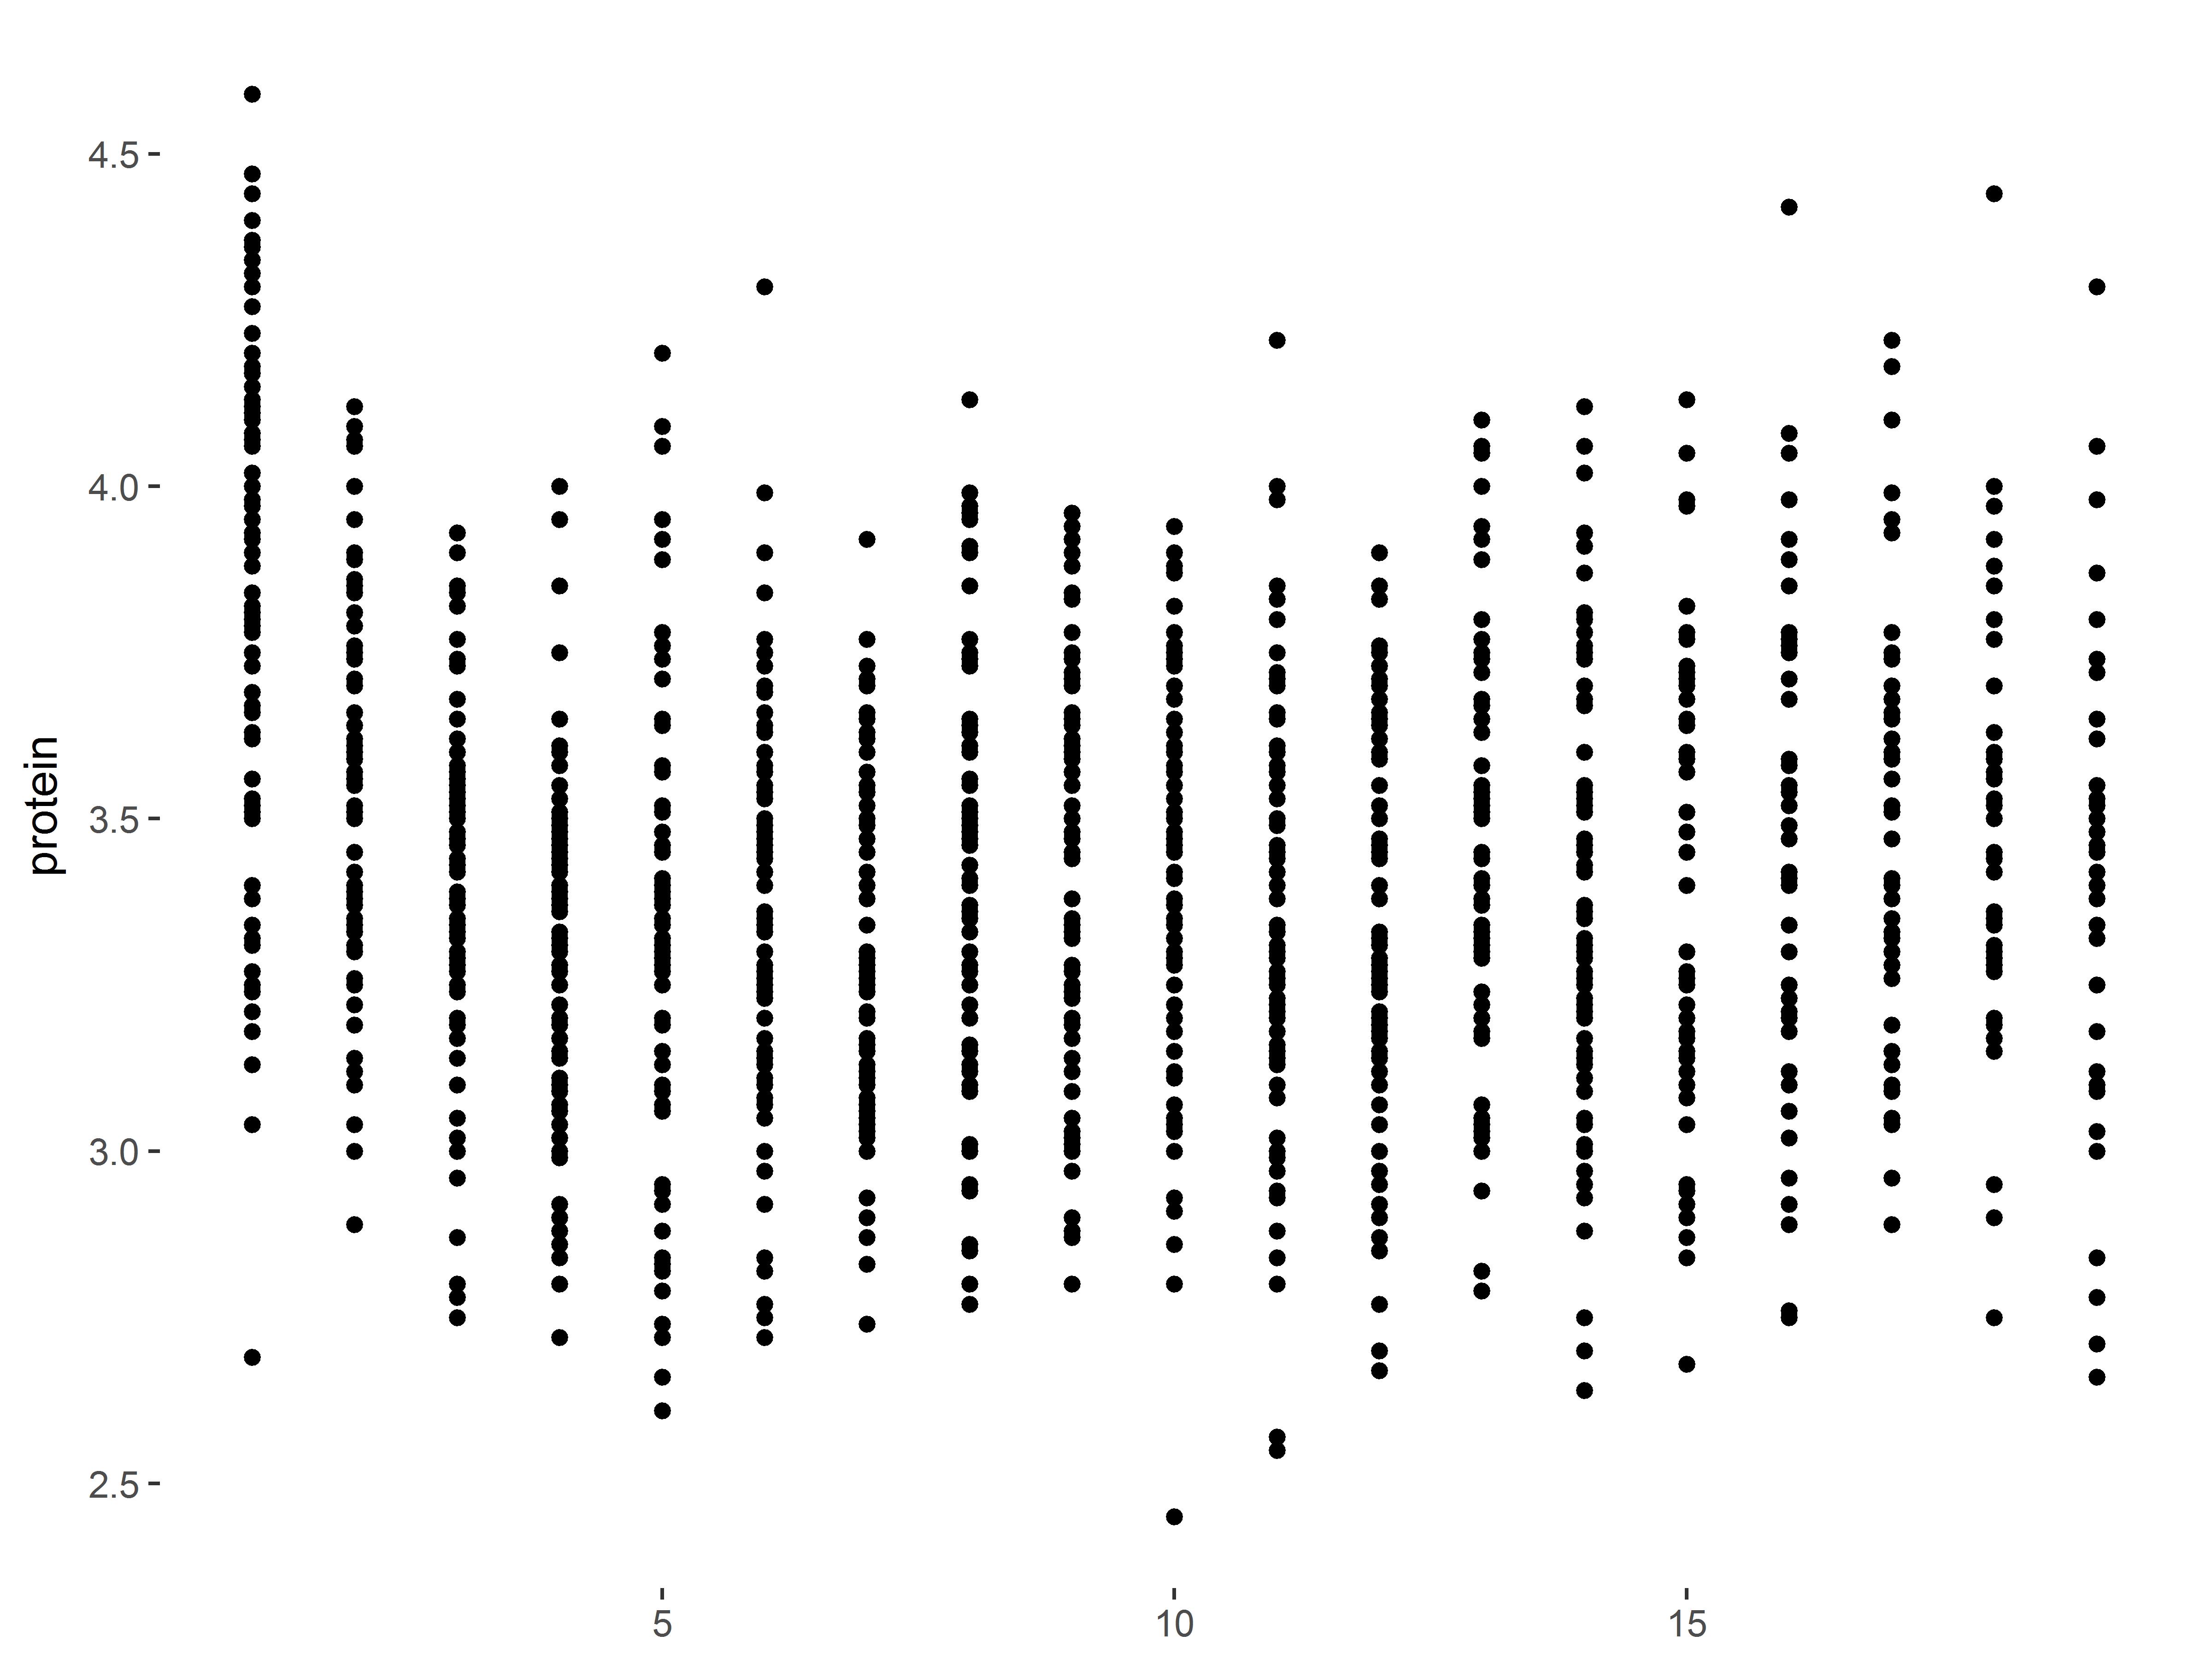 Image ggplot2-a25-1-1